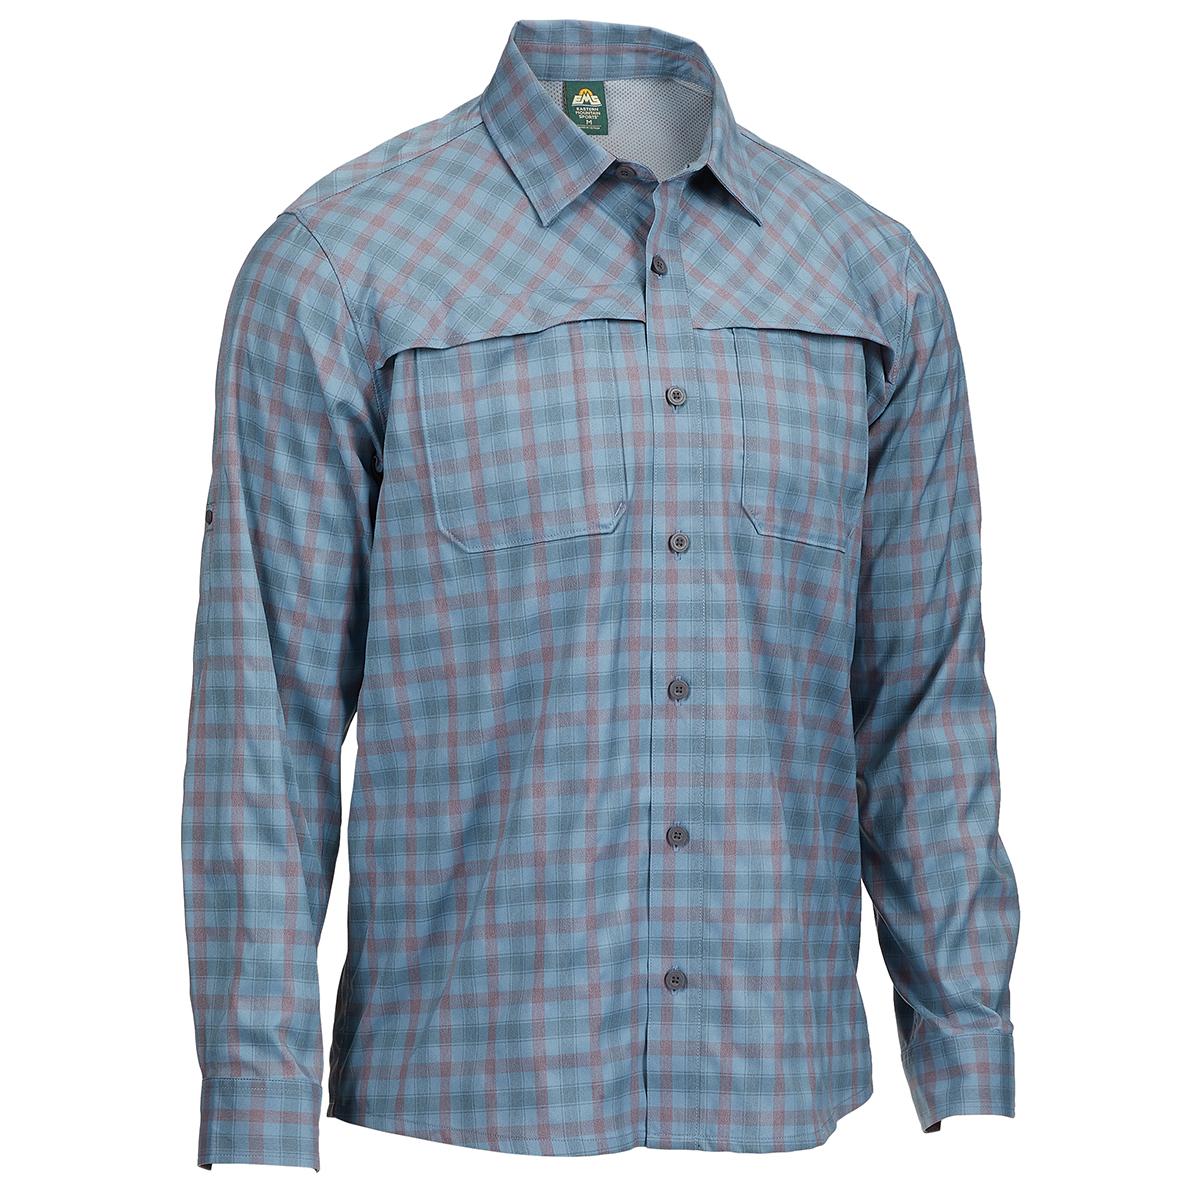 Ems Men's Journey Plaid Long-Sleeve Shirt - Black, S